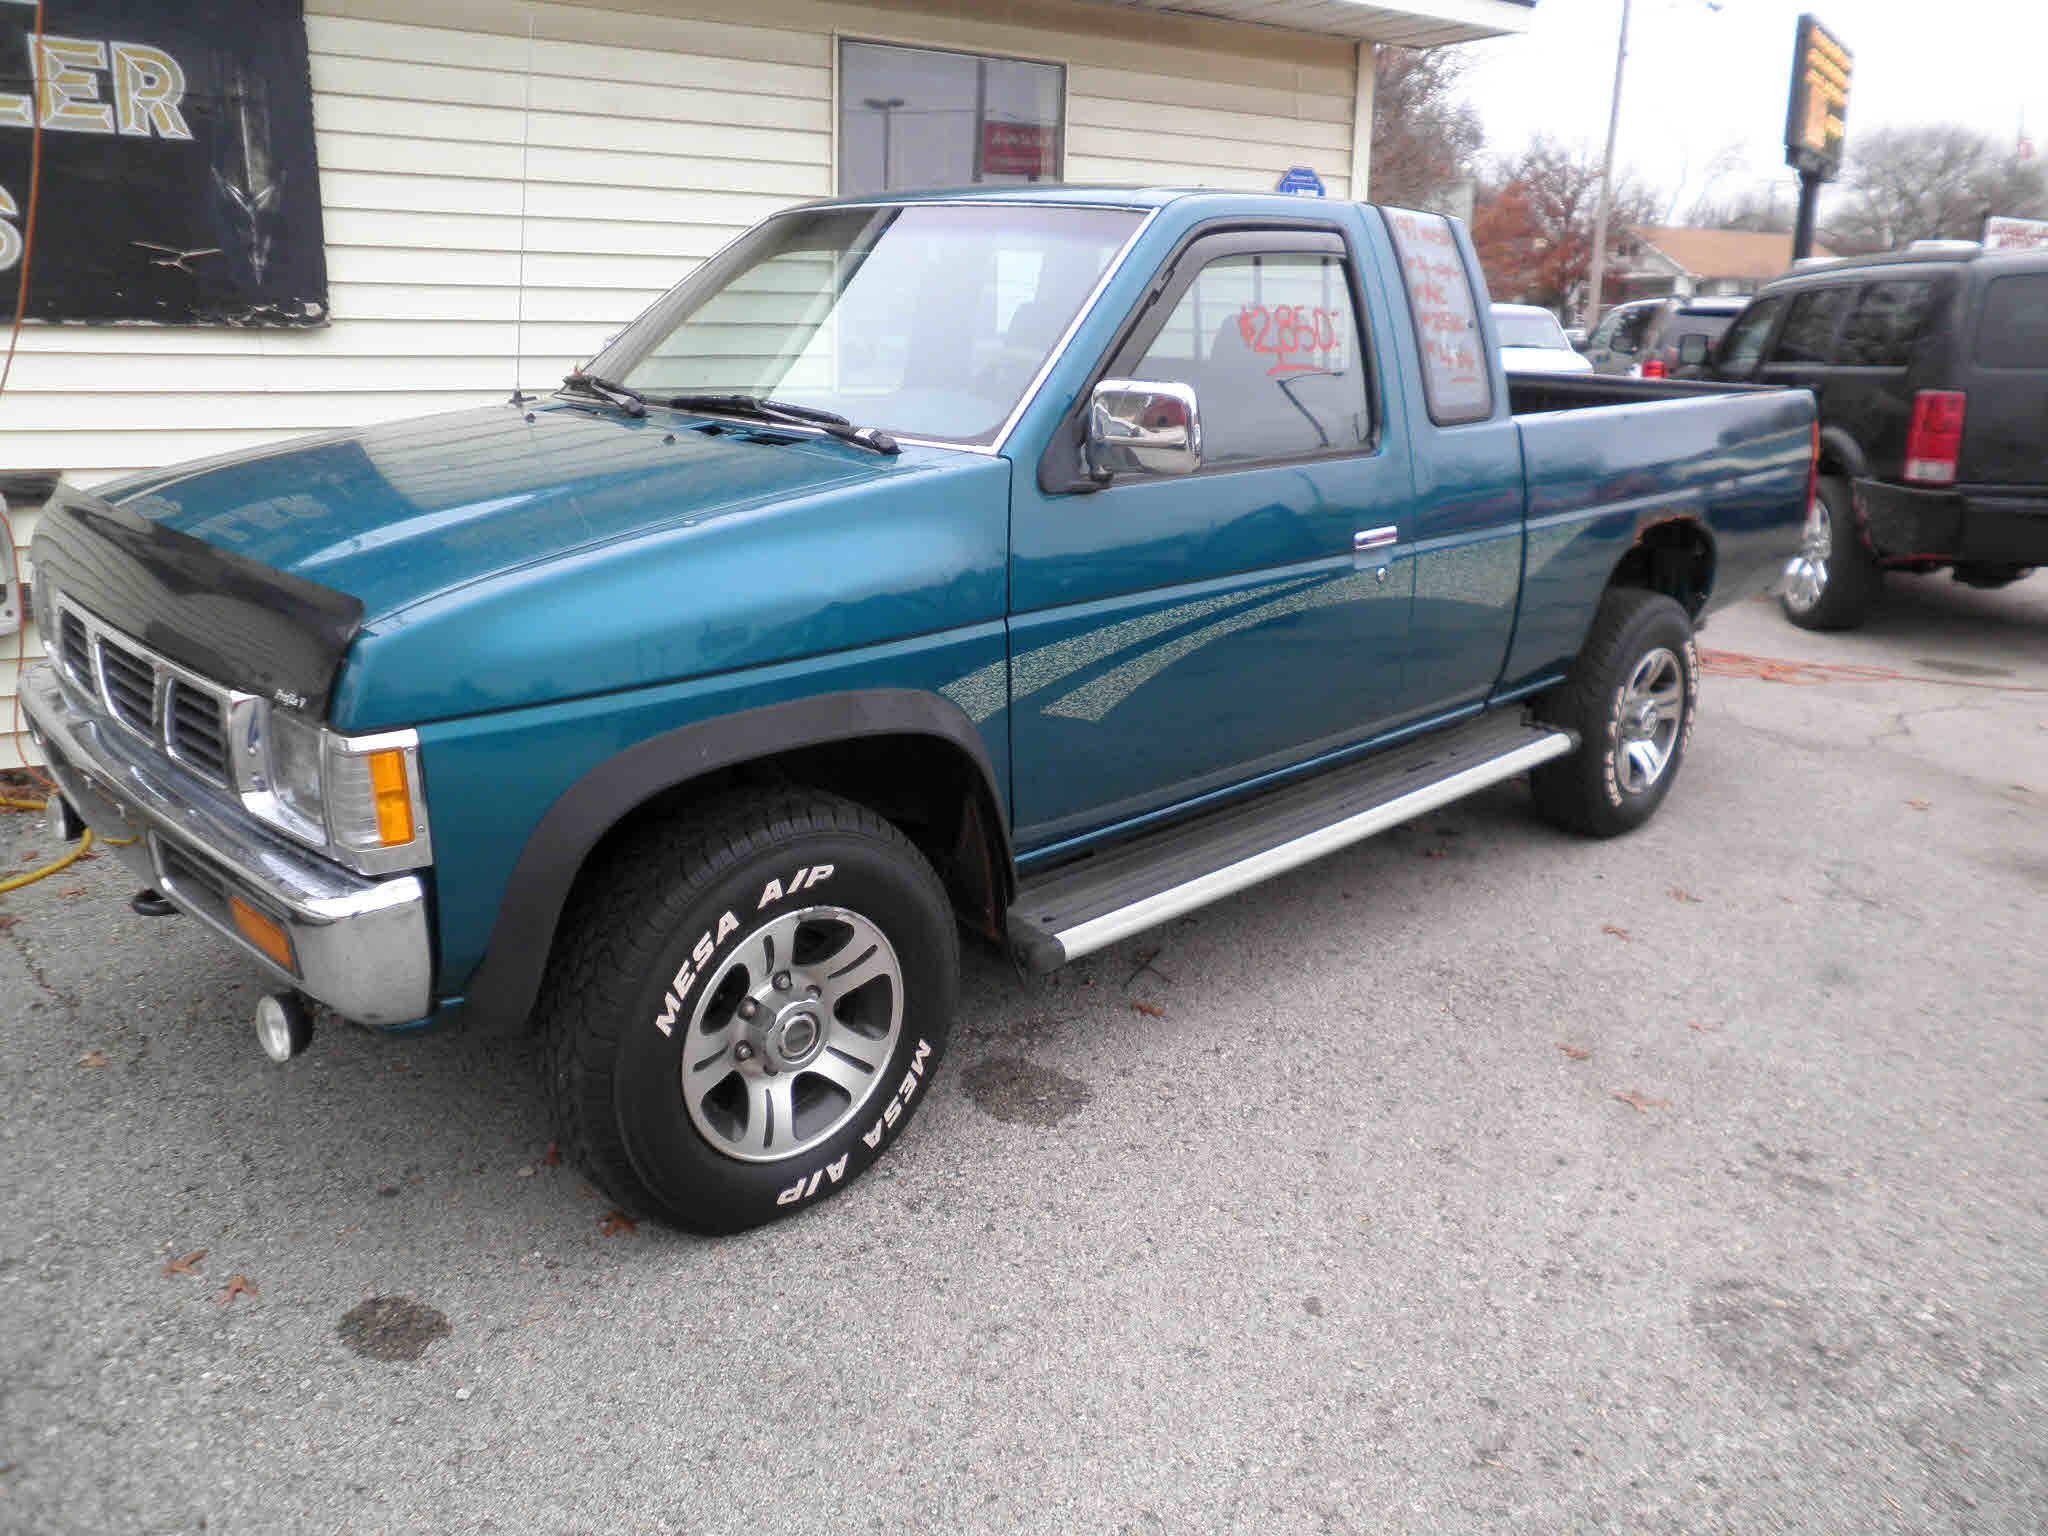 1997 nissan pickup green grey cloth interior 4 cylinder 5 speed 4x4 2 door a c tilt am fm 233 425 miles local truck great farm truck